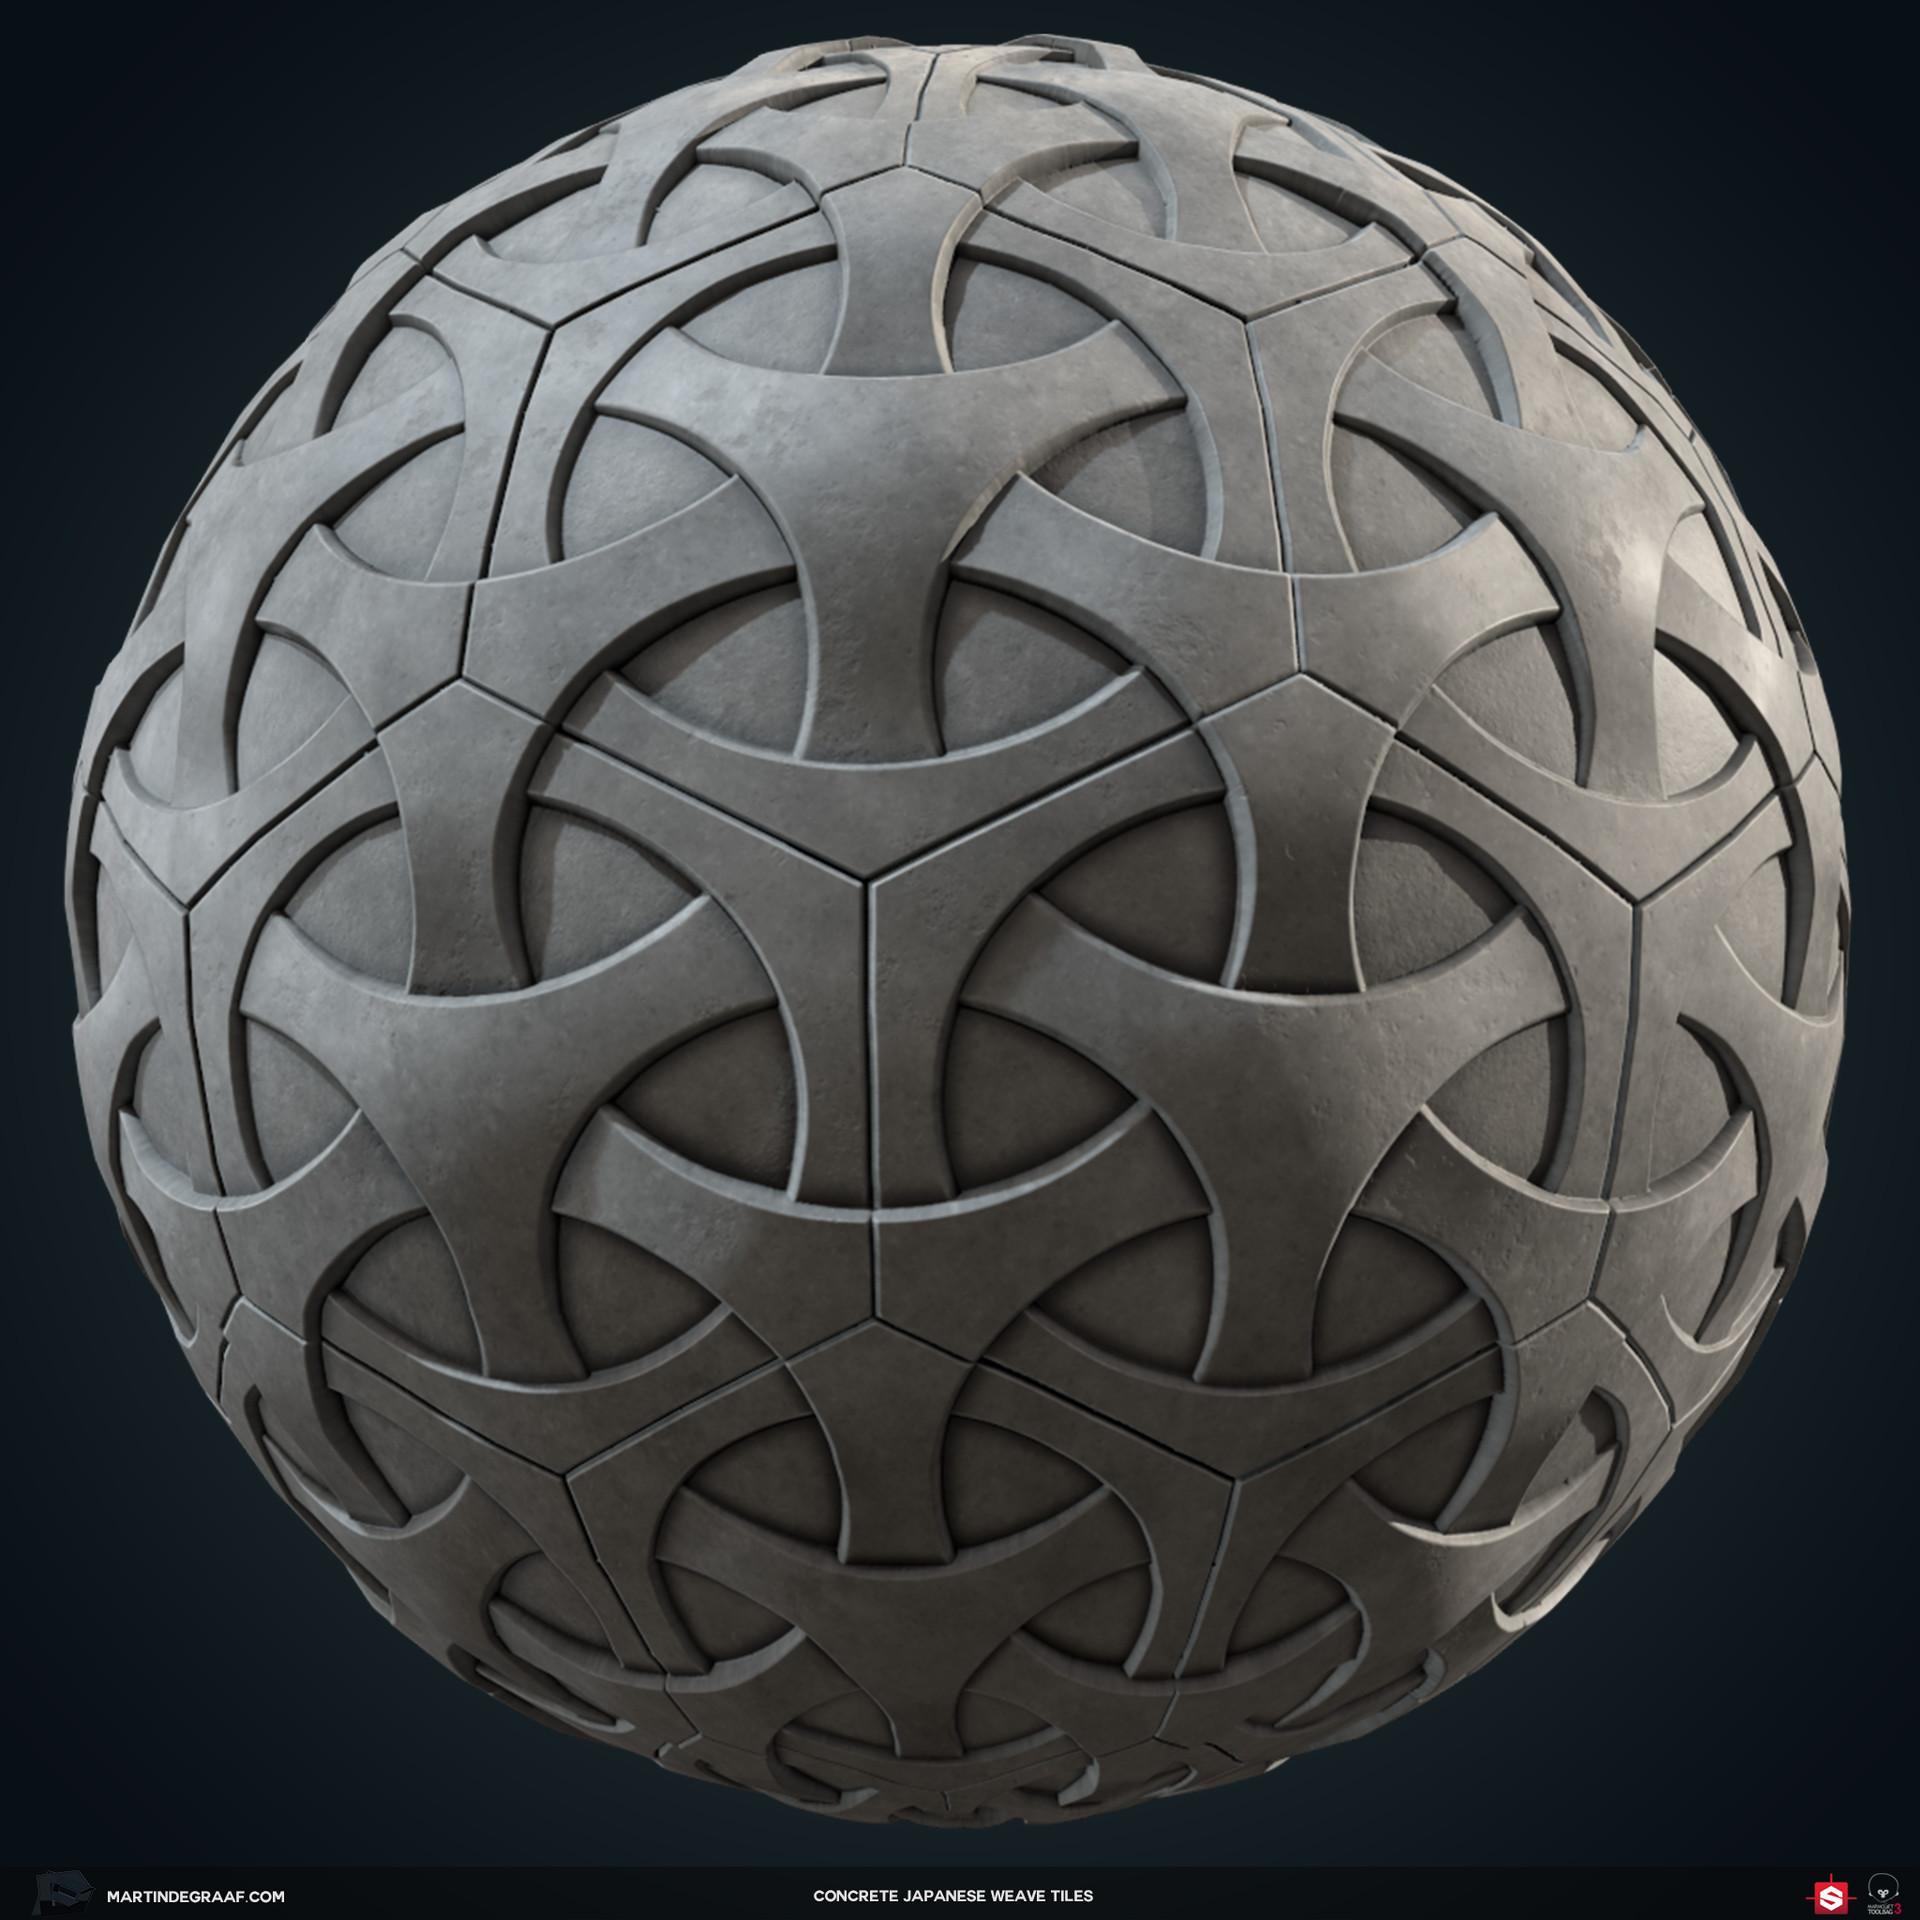 Martin de graaf japanese weave substance sphere martin de graaf 2018